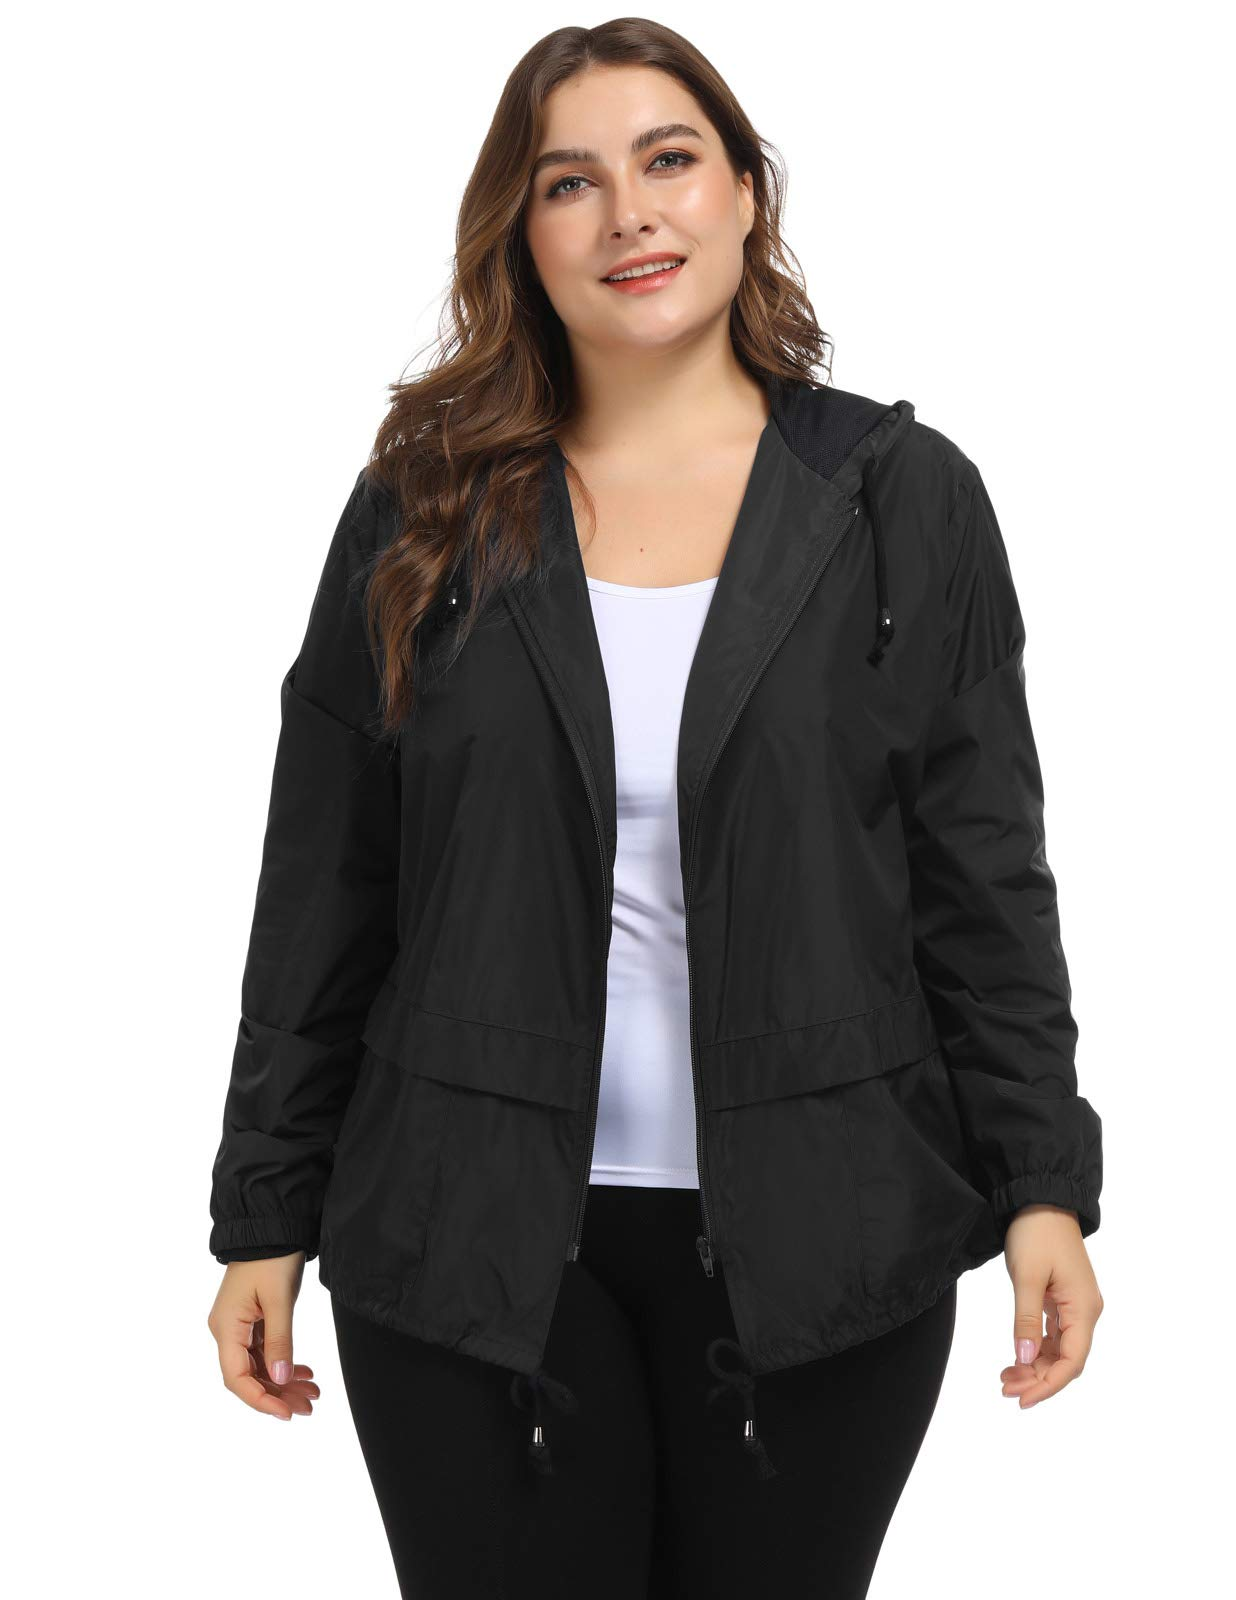 e0b624bb4 Hanna Nikole Women's Plus Size Lightweight Raincoat Hooded Packable Rain  Jacket